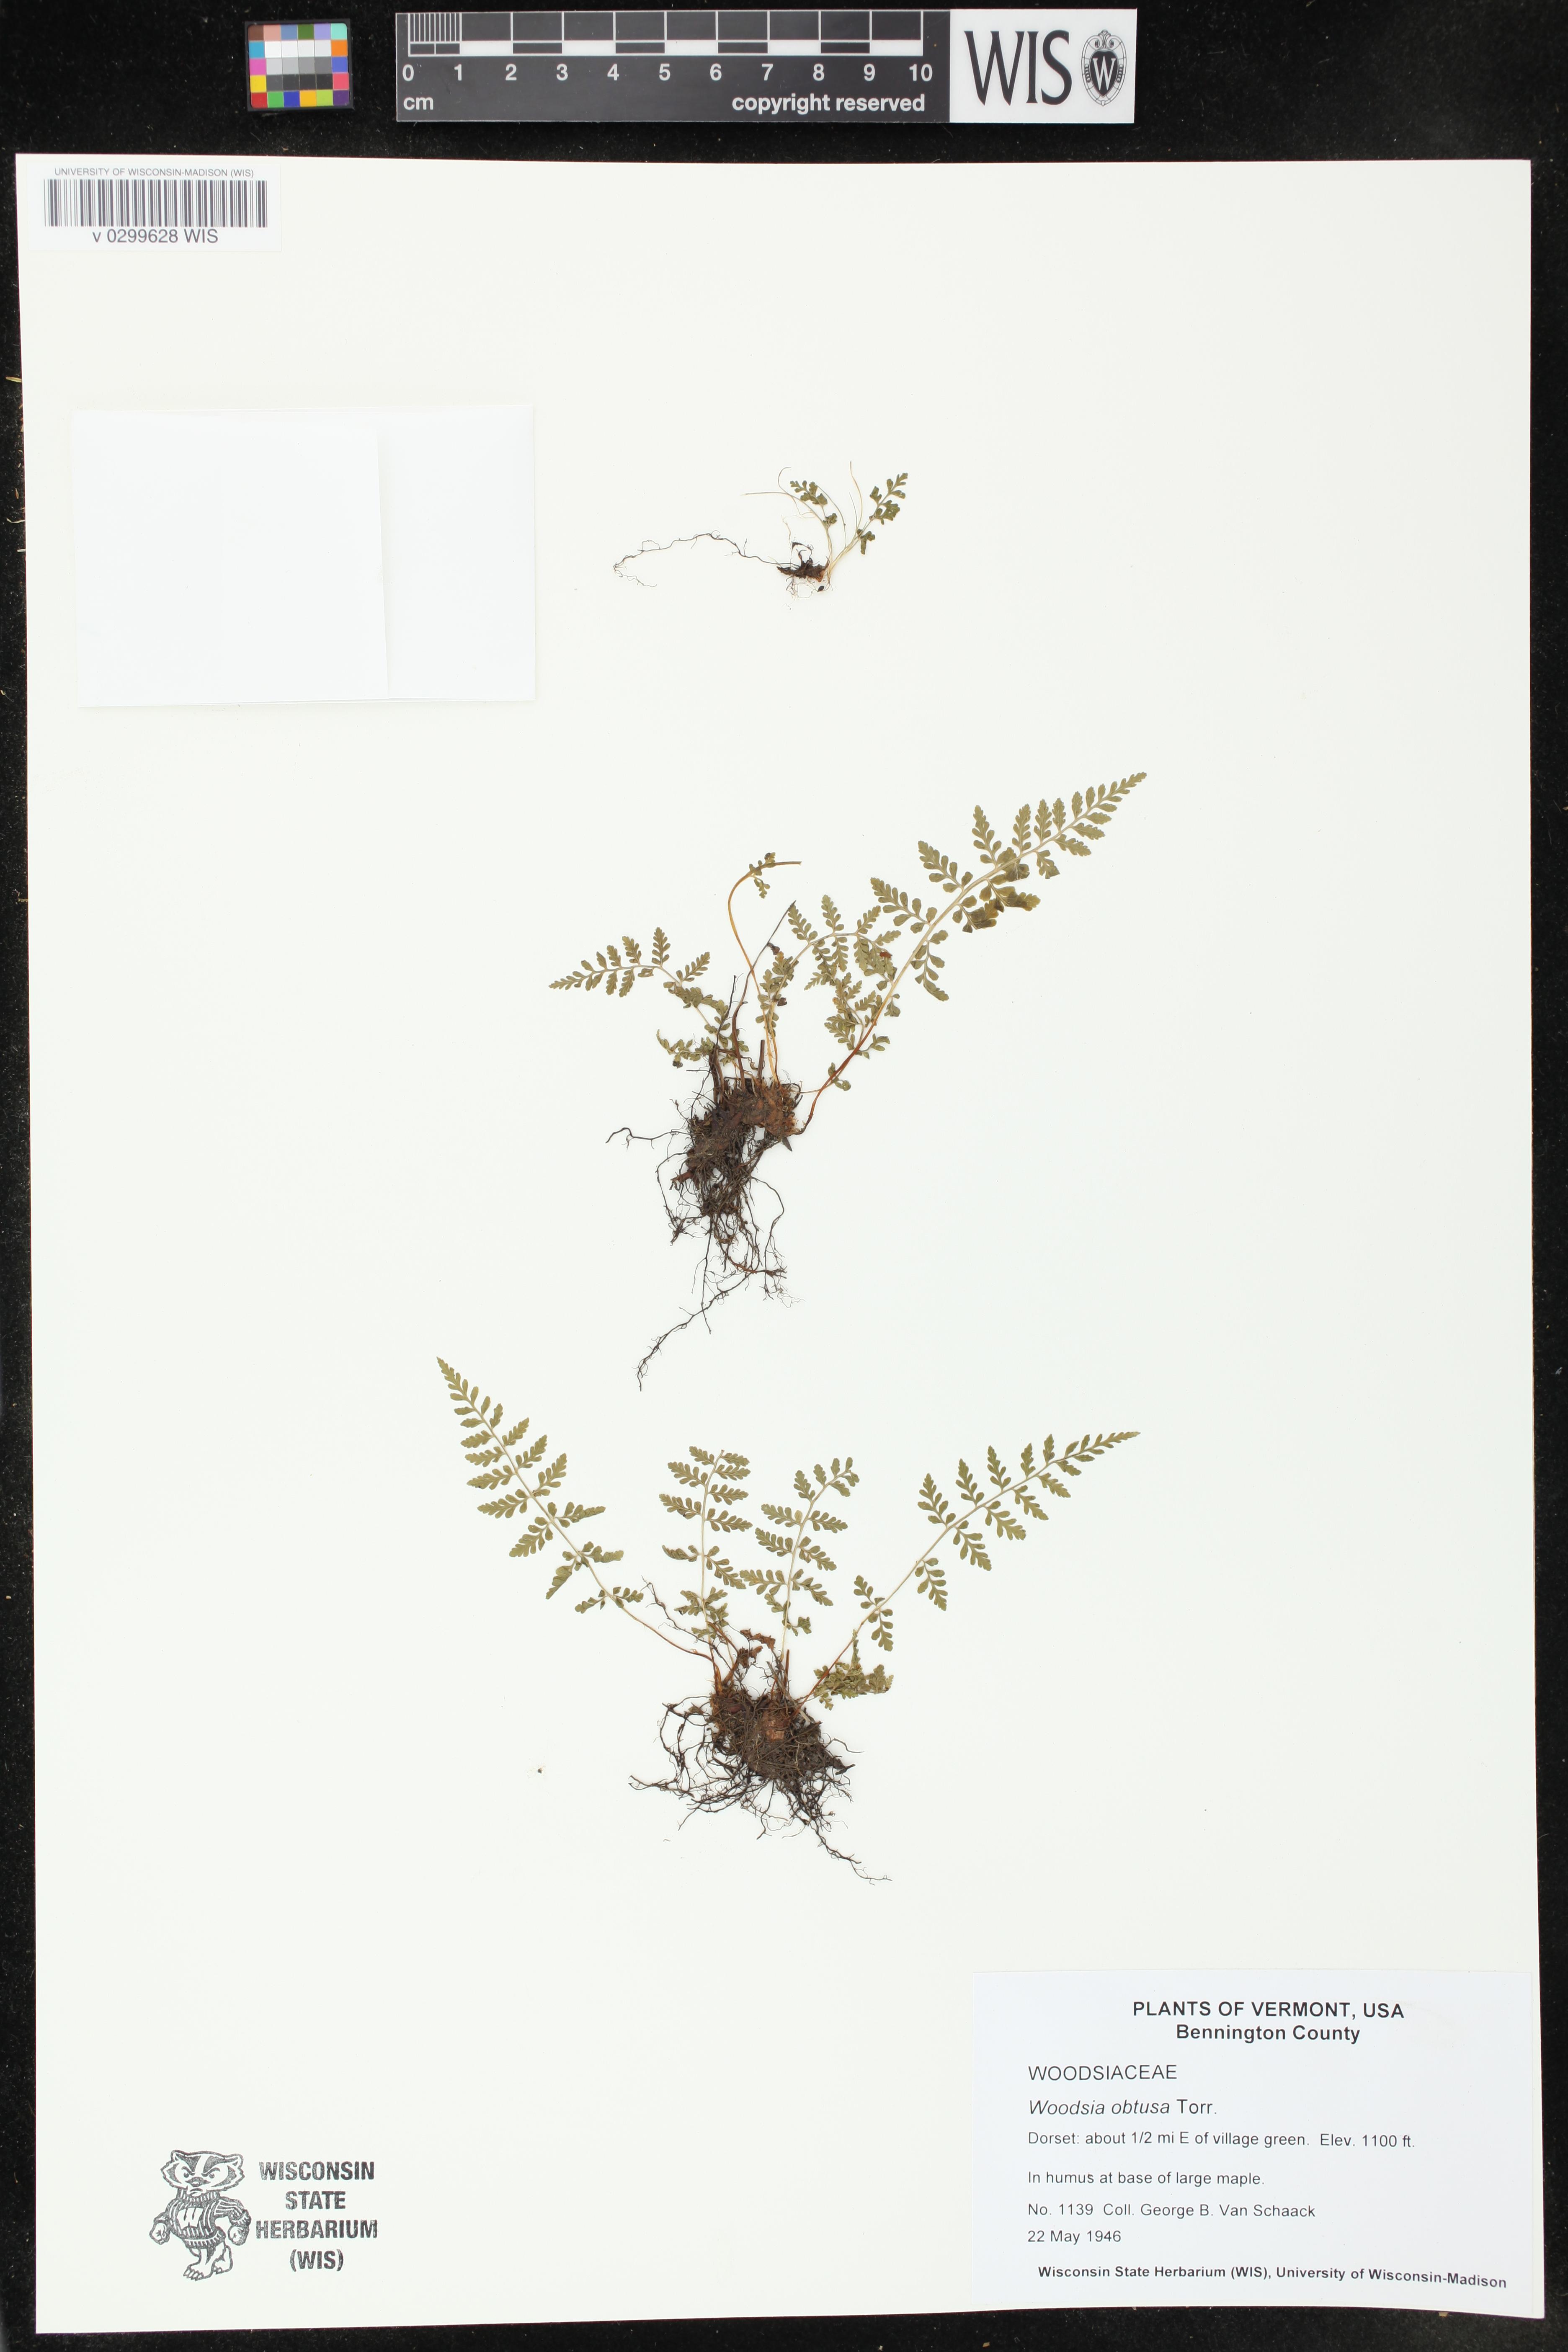 Image of Woodsia obtusa